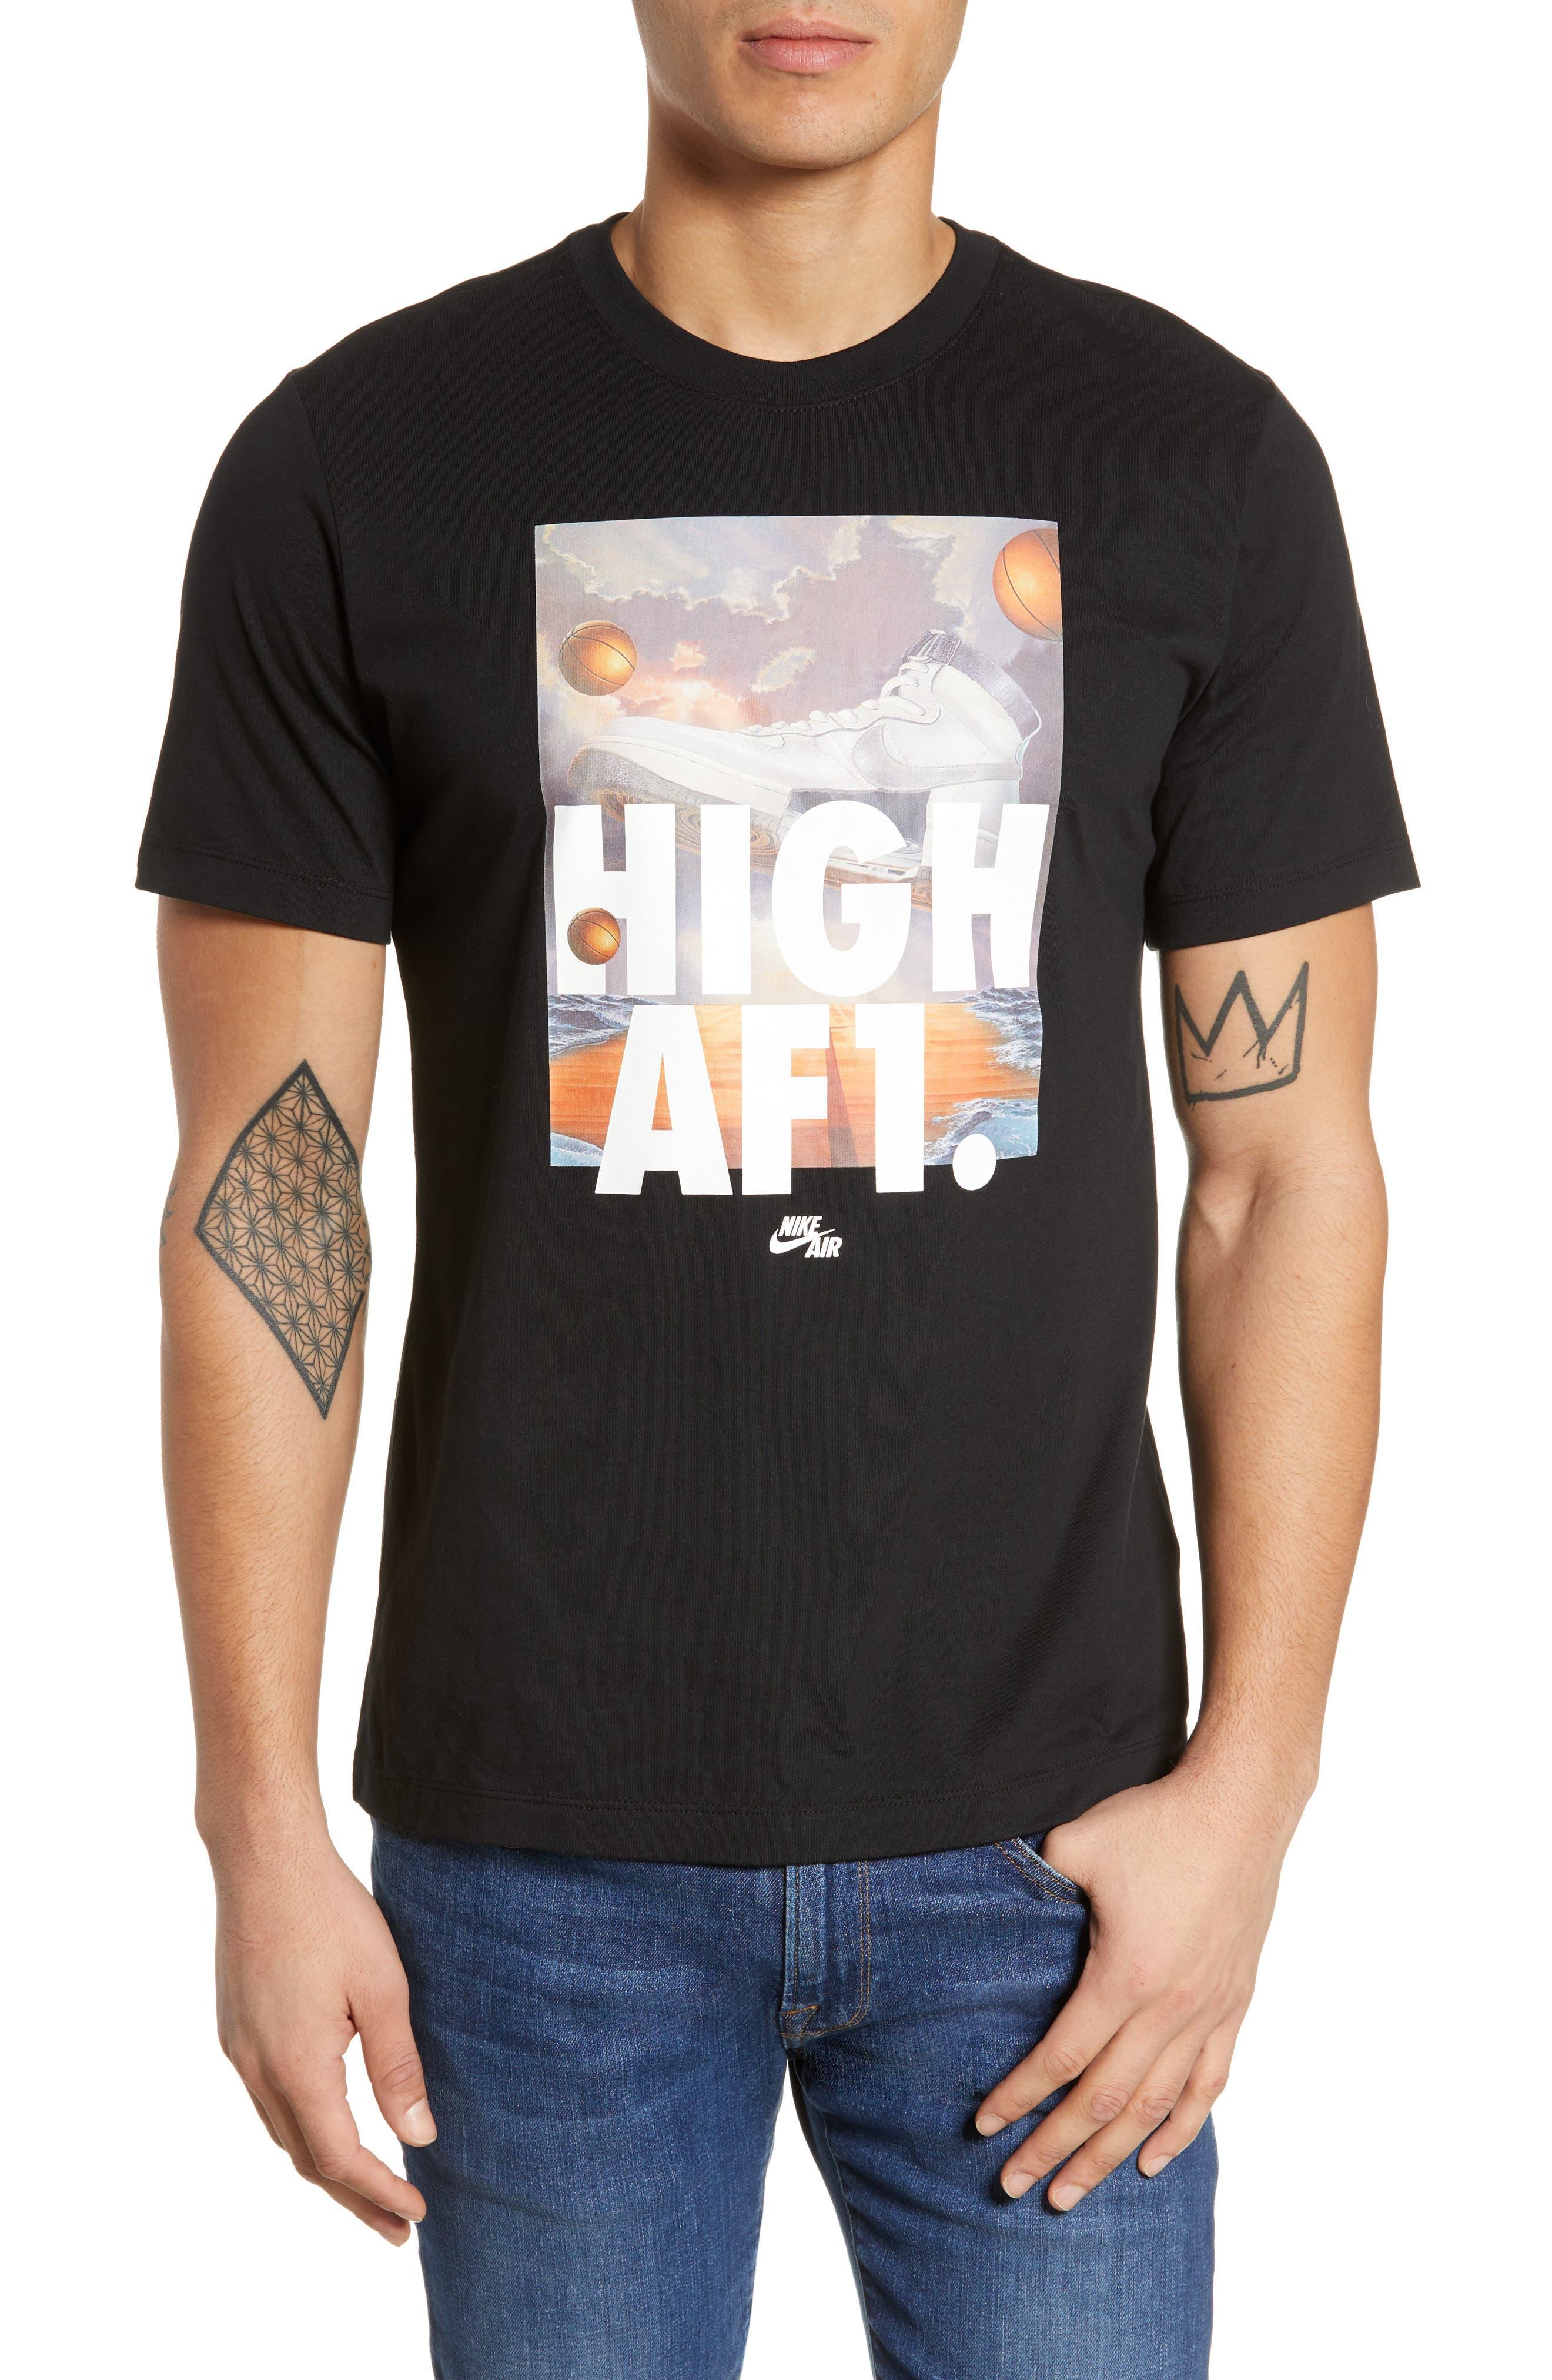 8f2416a00955 Nike Air Force 1 T-Shirt Black